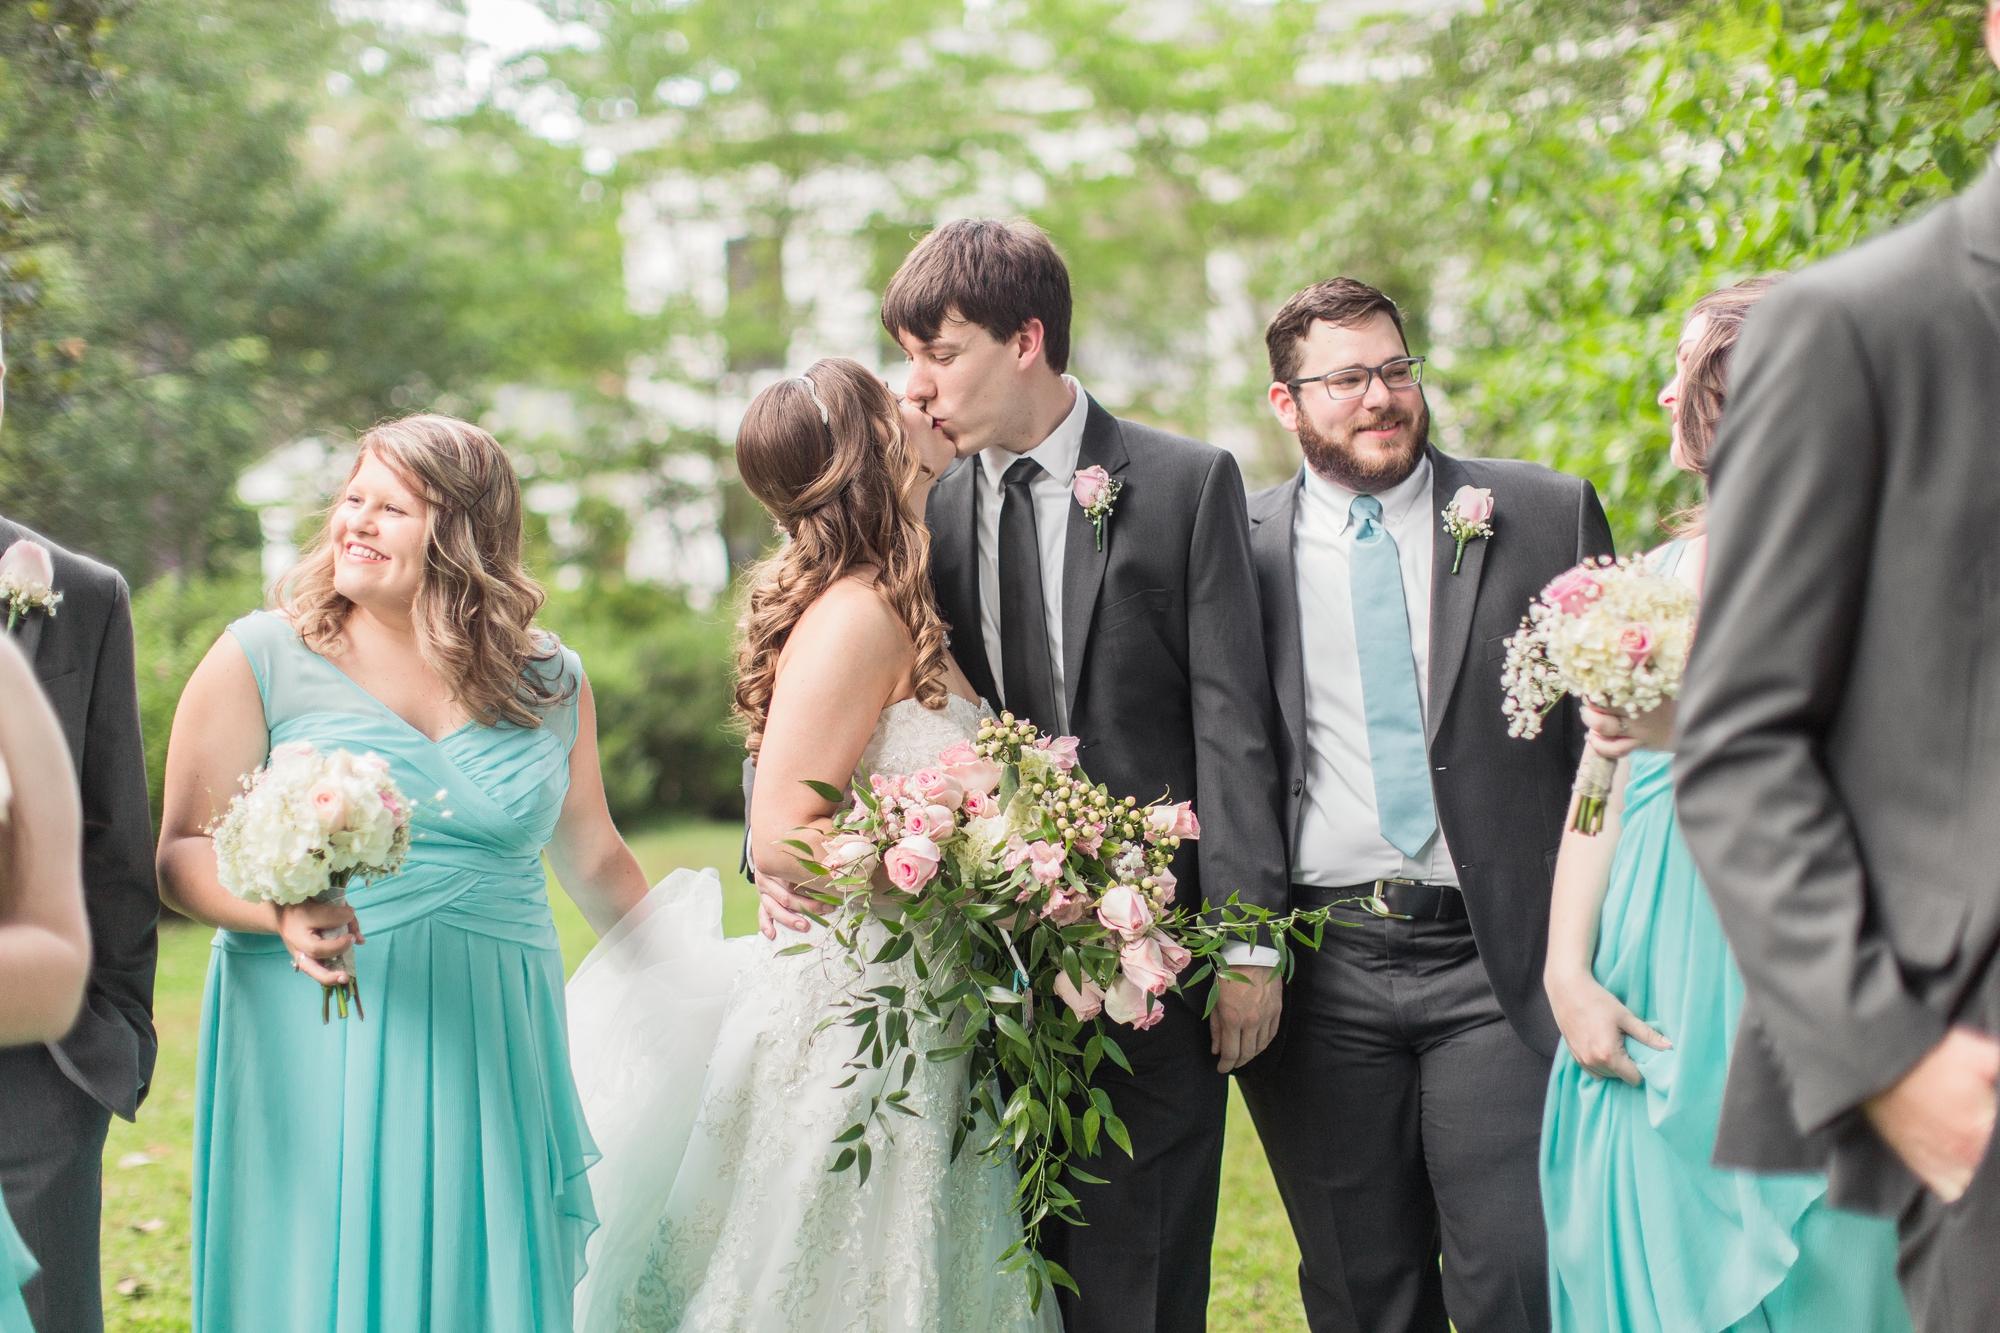 hendersonwedding-245.jpg